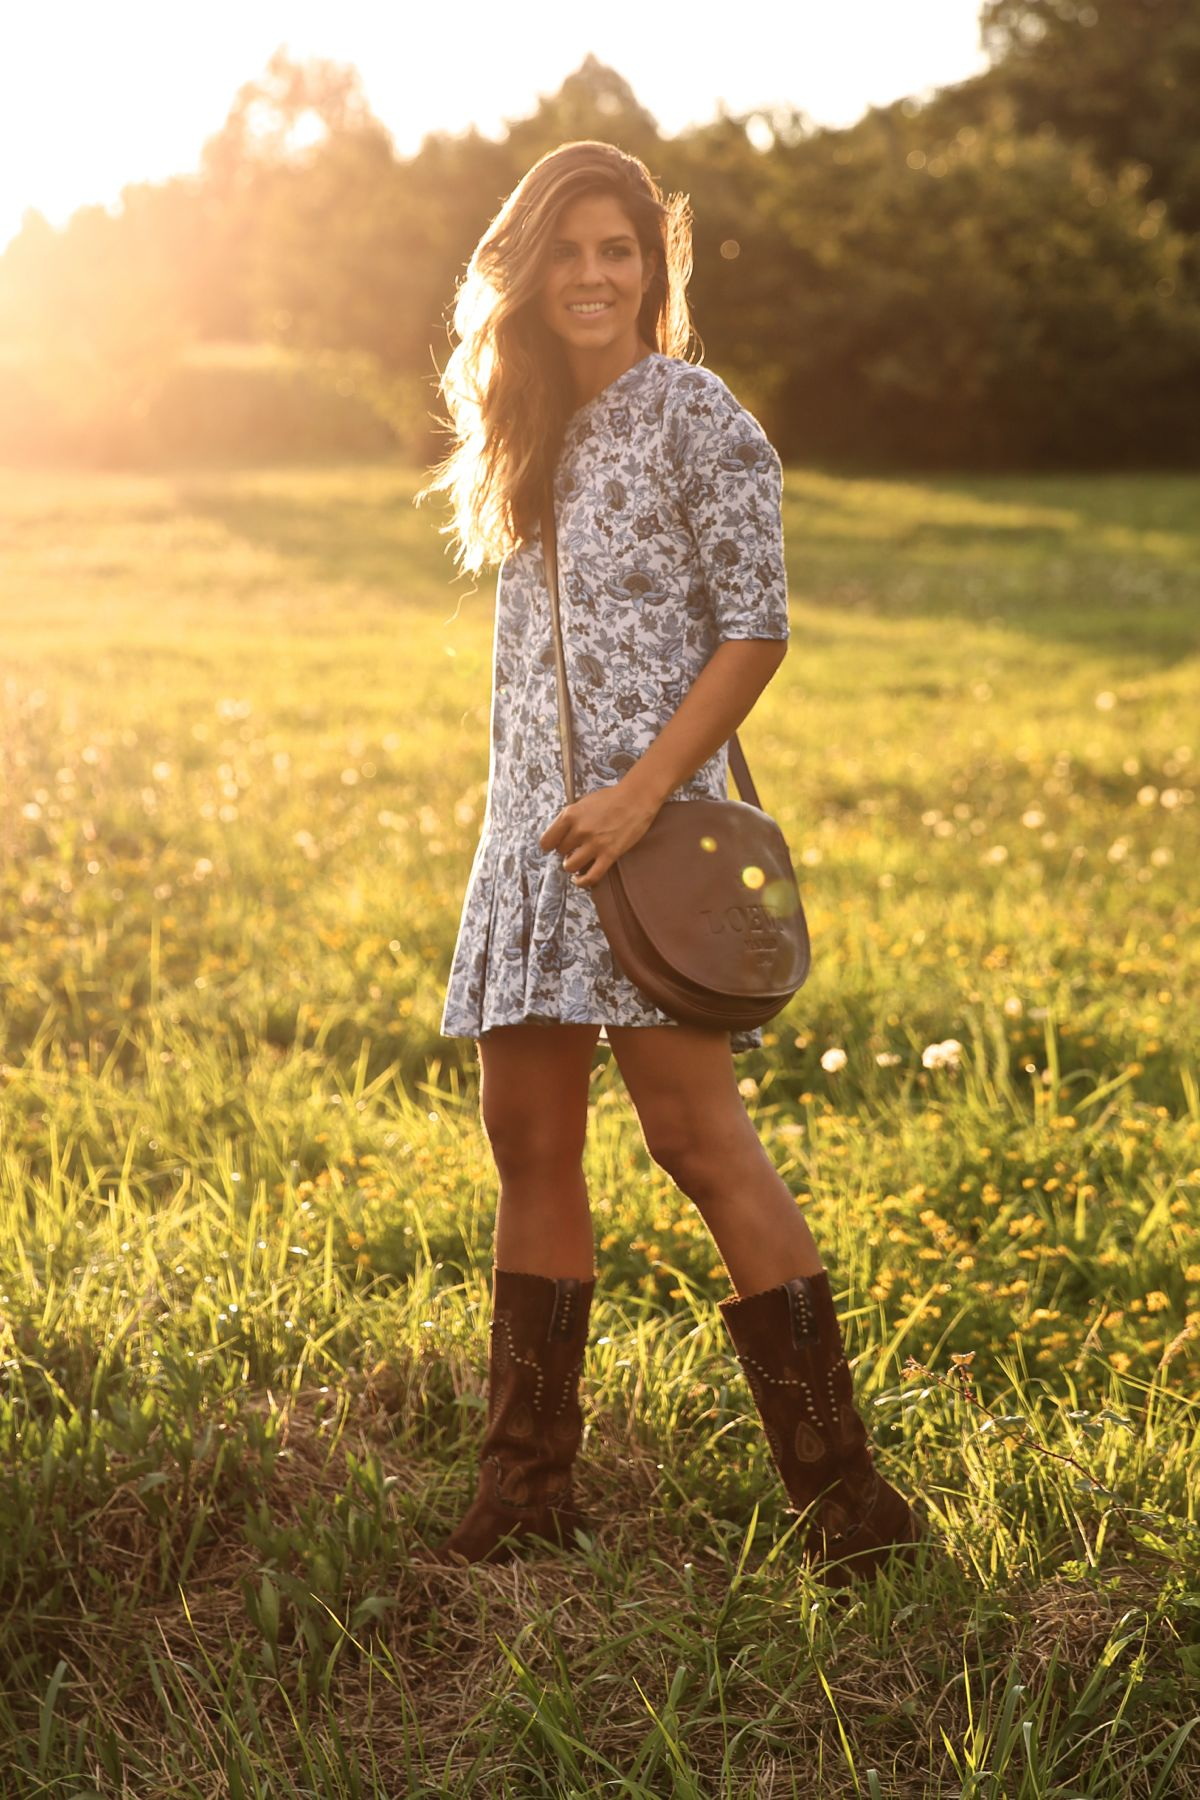 trendy_taste-look-outfit-street_style-ootd-blog-blogger-fashion_spain-moda_españa-cowboy-campero-sendra-cowboy_boots-botas_camperas-loewe-bag-bolso-vestido_flores-flower_print-dress-8